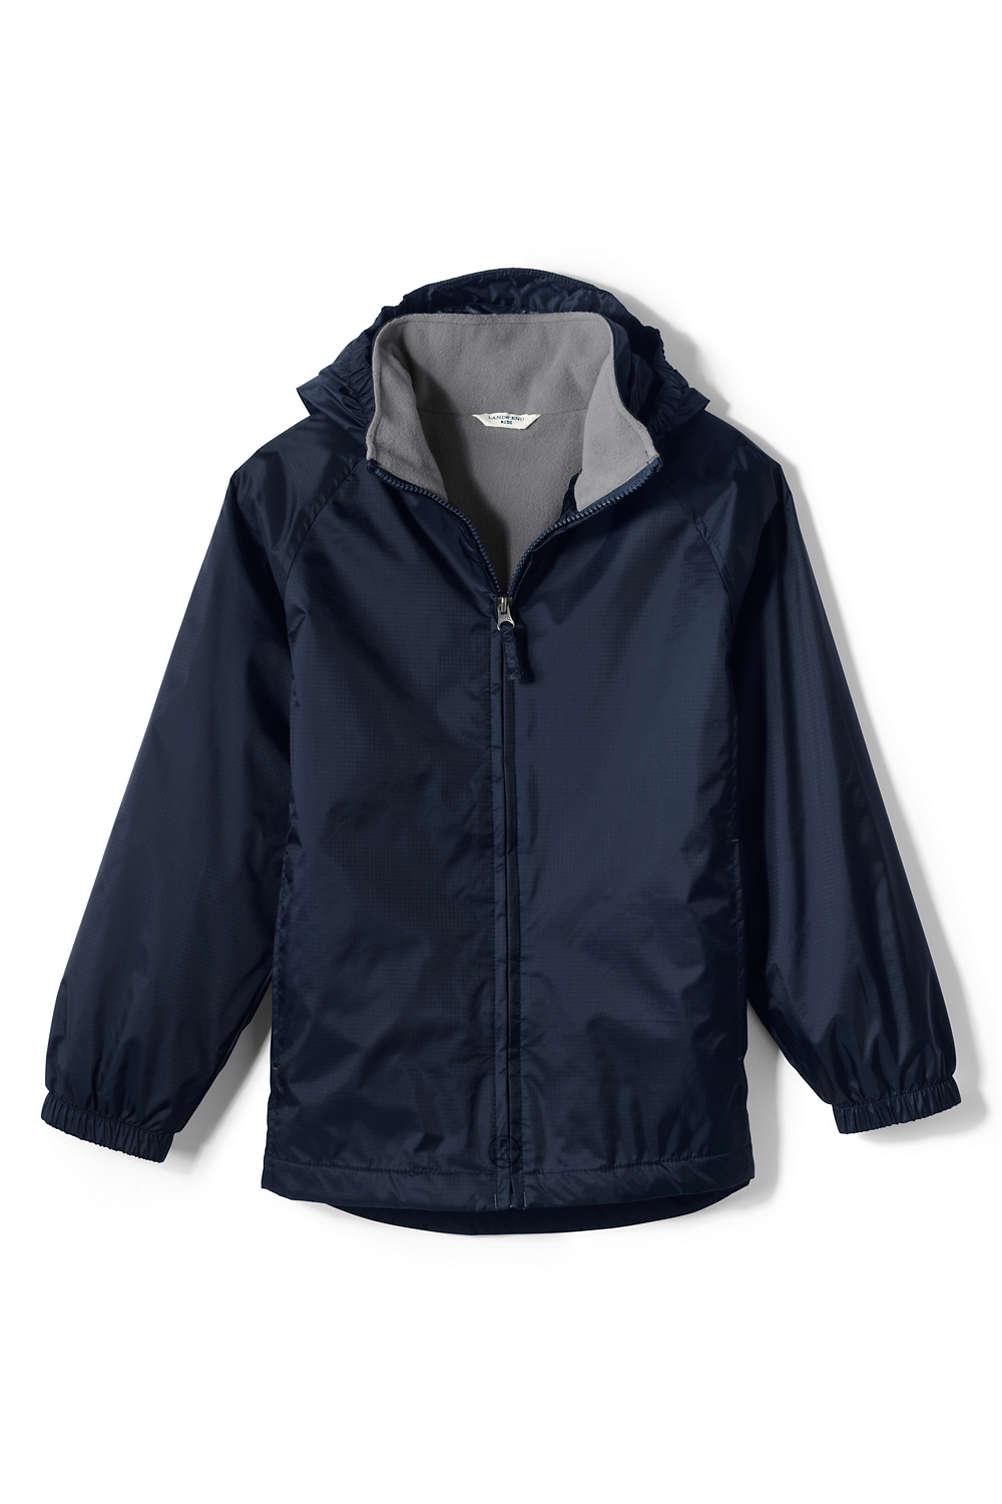 e6aeb38f187e School Uniform Fleece Lined Rain Jacket from Lands  End